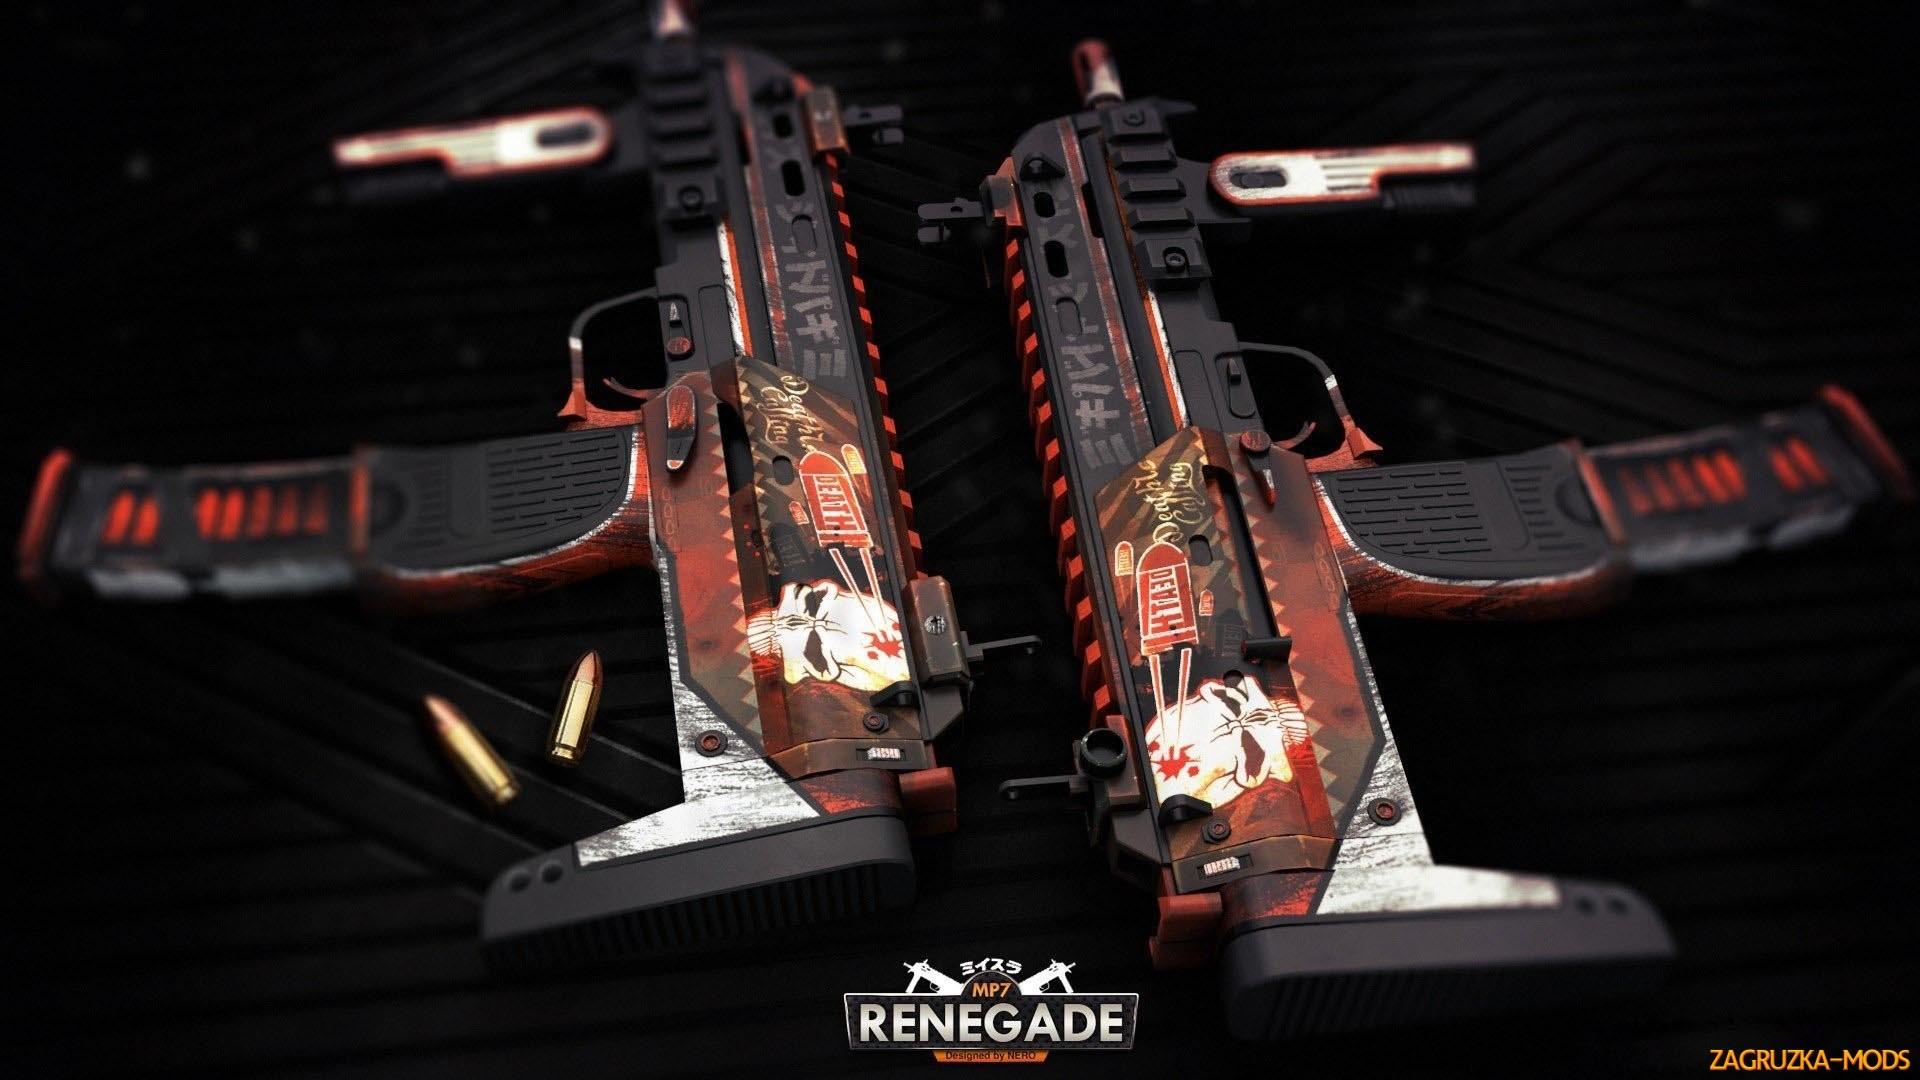 MP7 Renegade Skin for CS:GO